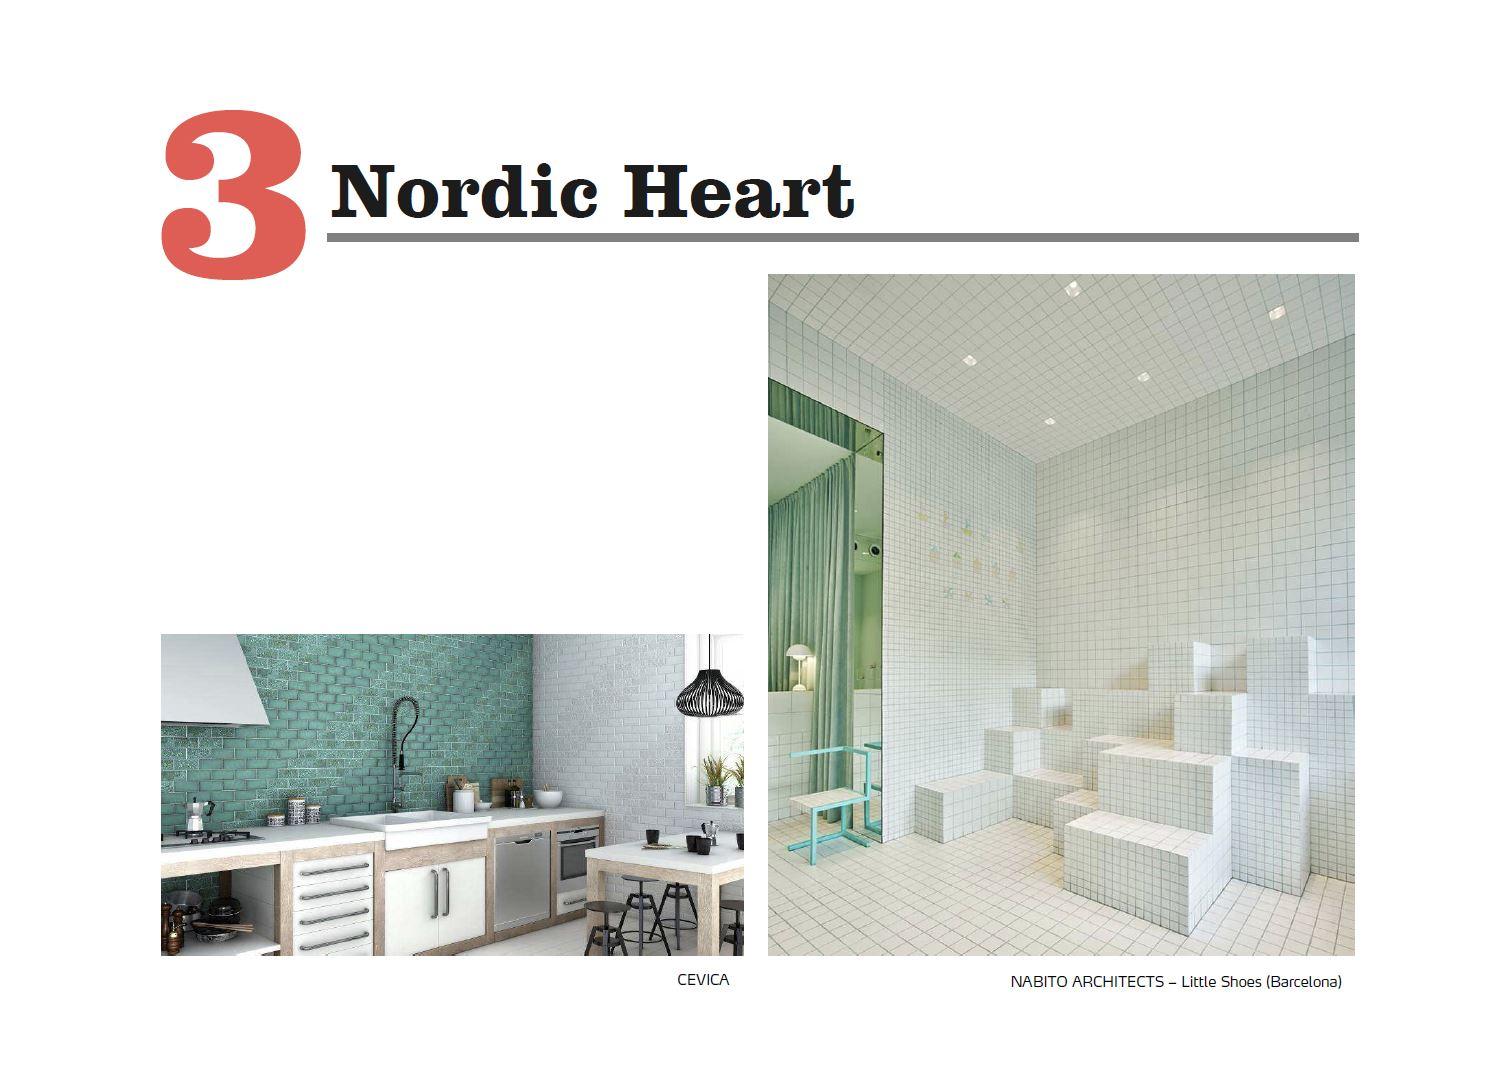 Nordic-Heart-tendencias-ceramicas-2016-oth-ceramica-a-mano-alzada